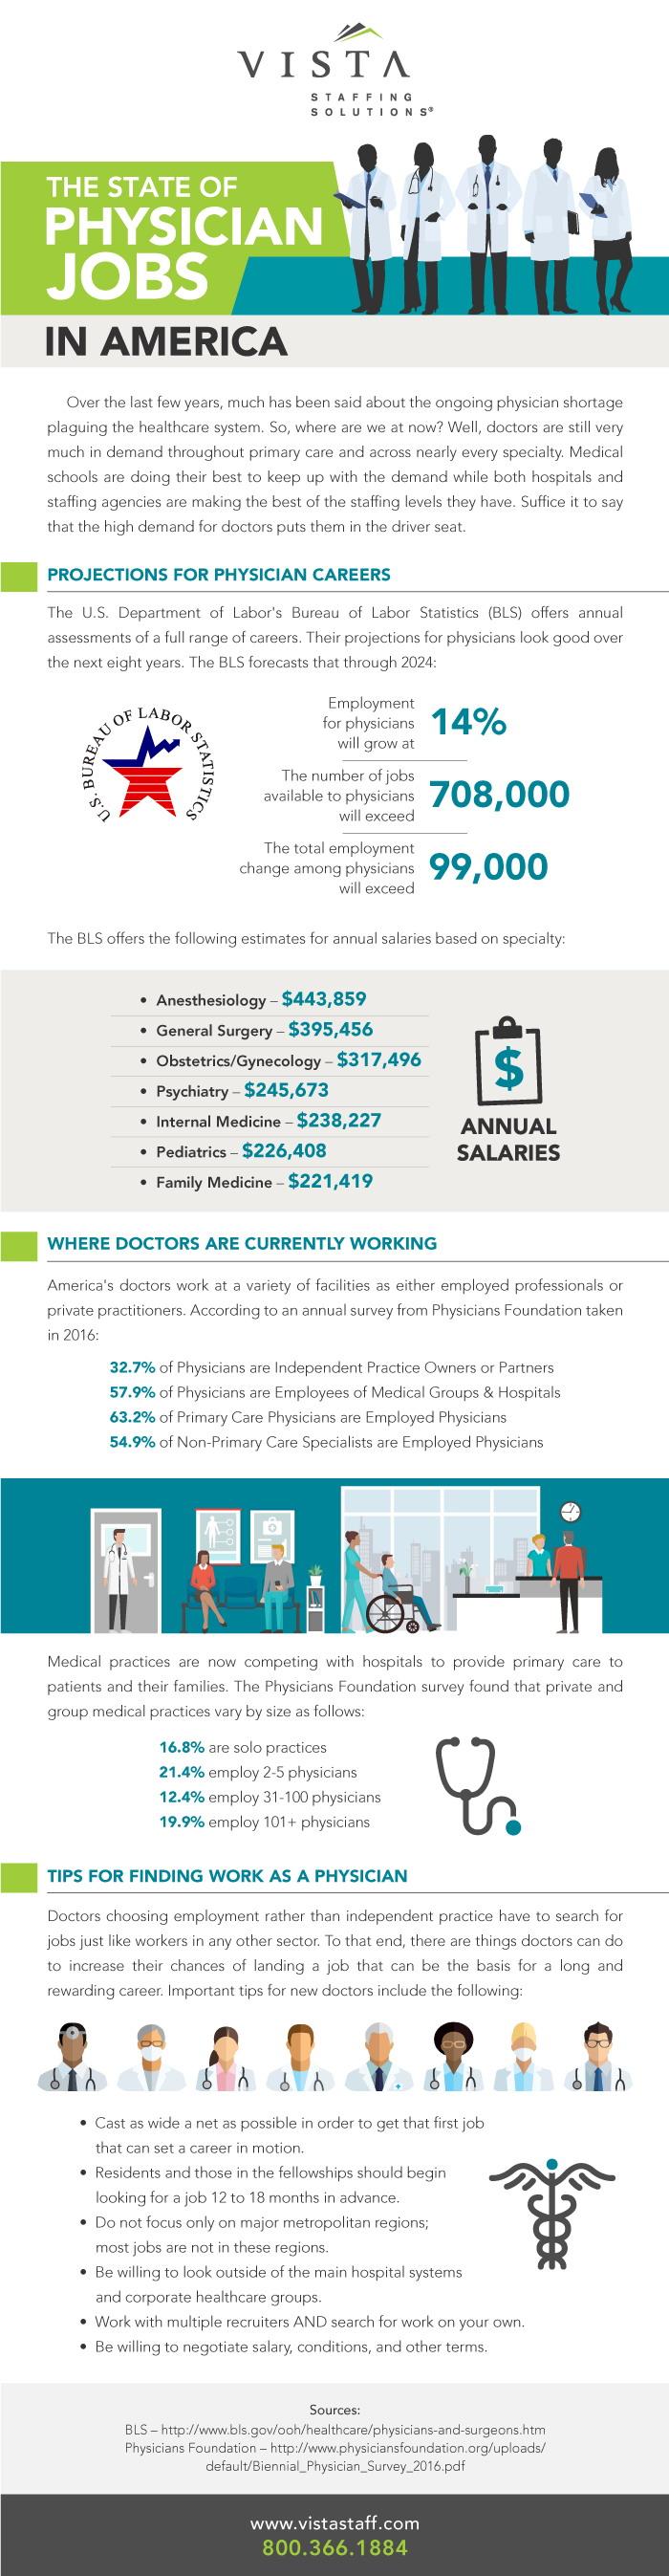 Physician-Jobs-Infographic.jpg